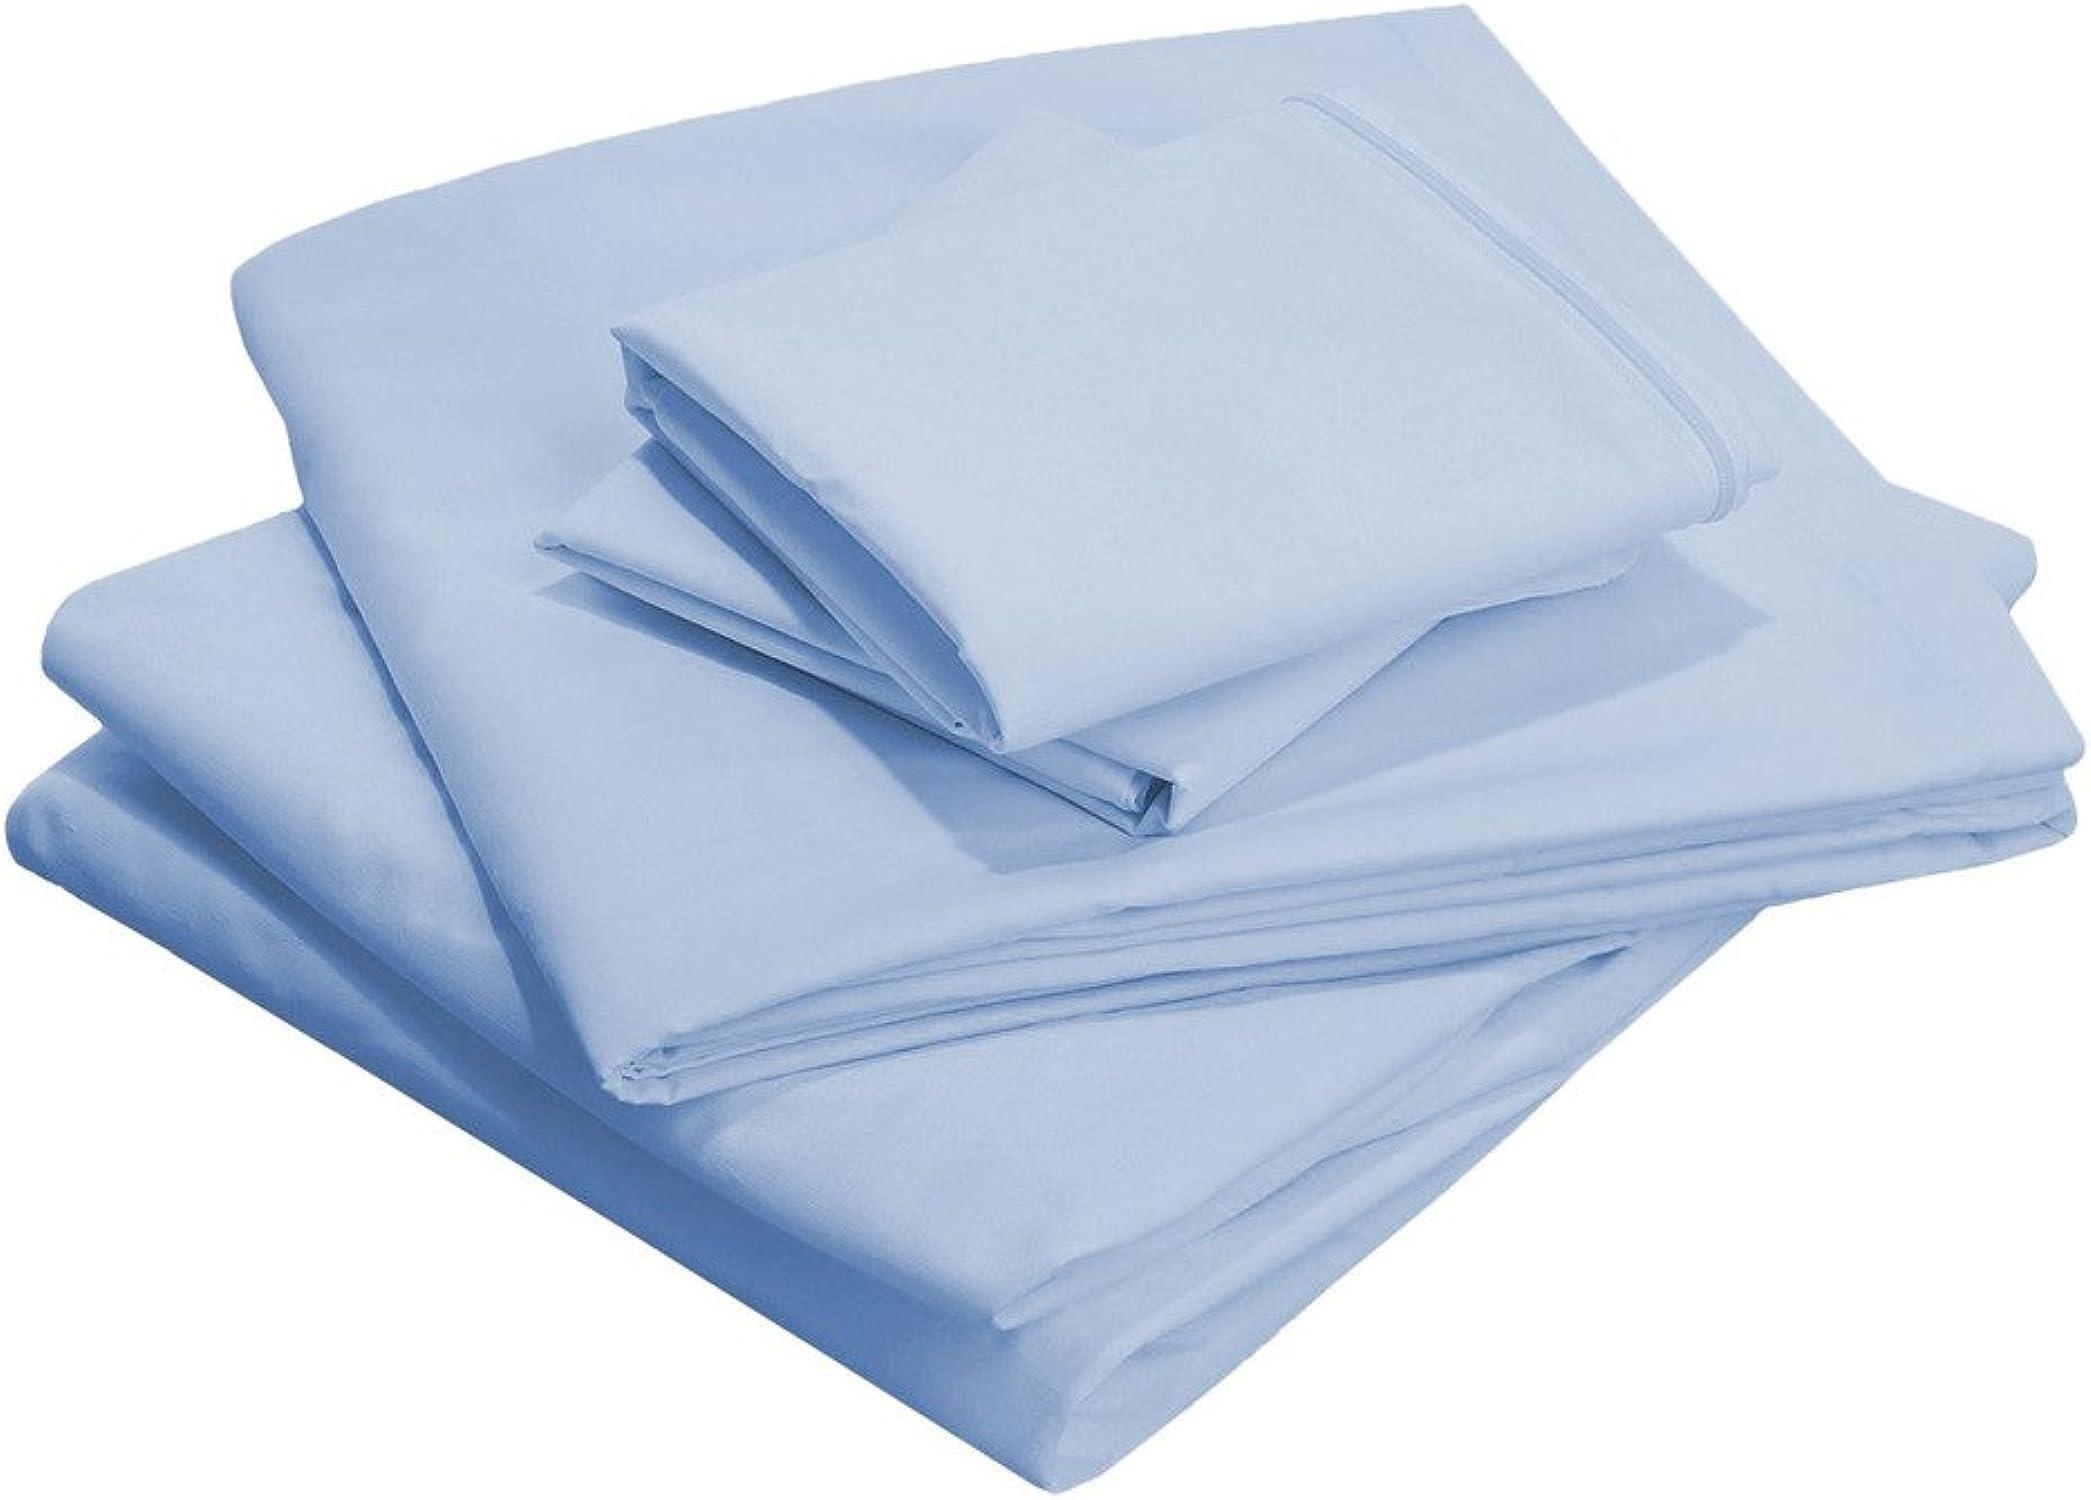 envio rapido a ti Scala Bedding Bedding Bedding de 18pulgadas Profundidad funda, 100% algodón egipcio, 400hilos, XL, 2unidades) azul Sky  barato en línea